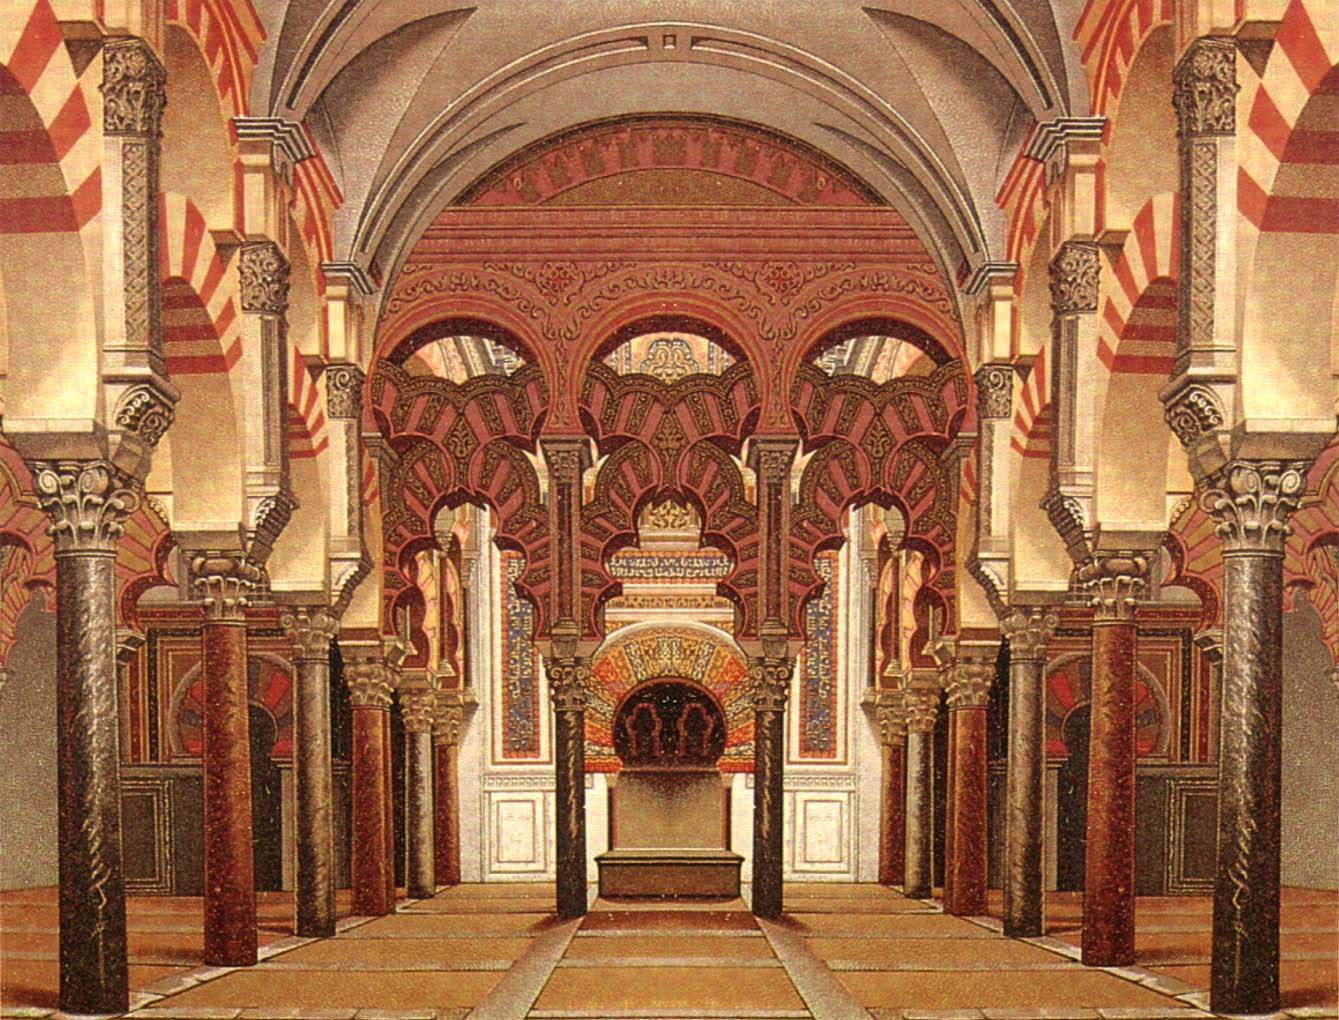 http://upload.wikimedia.org/wikipedia/commons/d/de/Mezquita_de_C%C3%B3rdoba_Mihrab.jpg